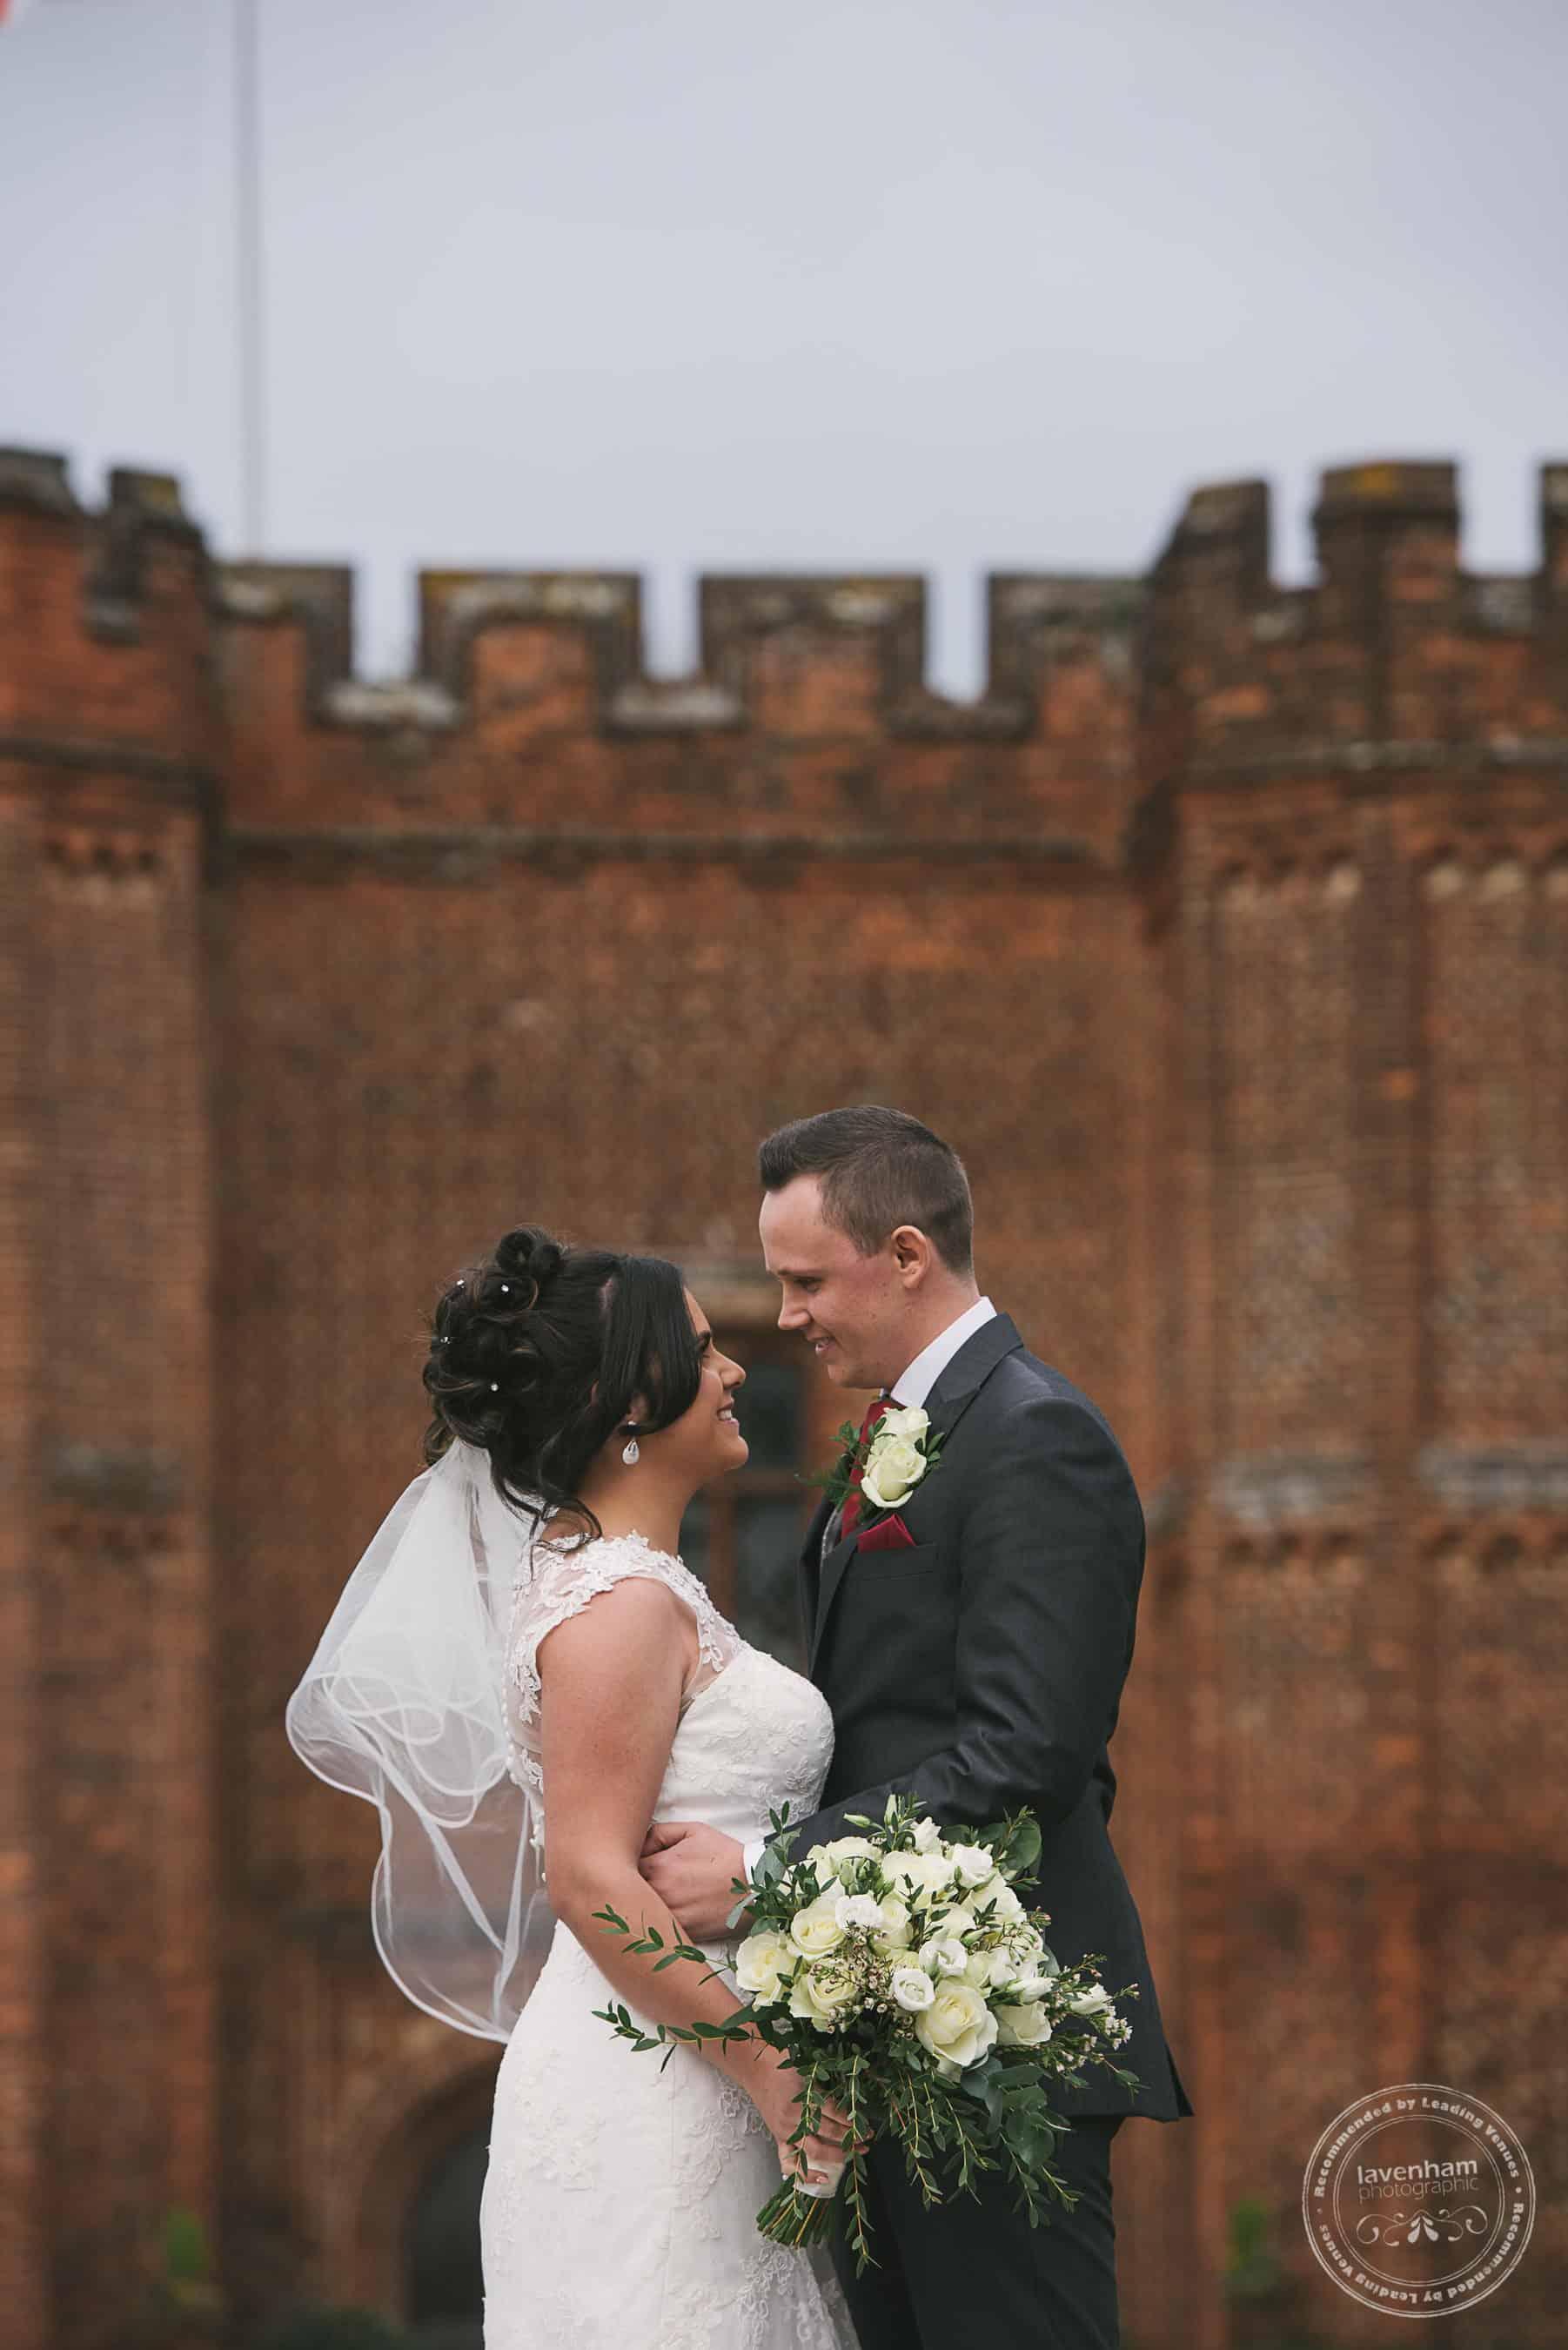 251118 Leez Priory Wedding Photography by Lavenham Photographic 055